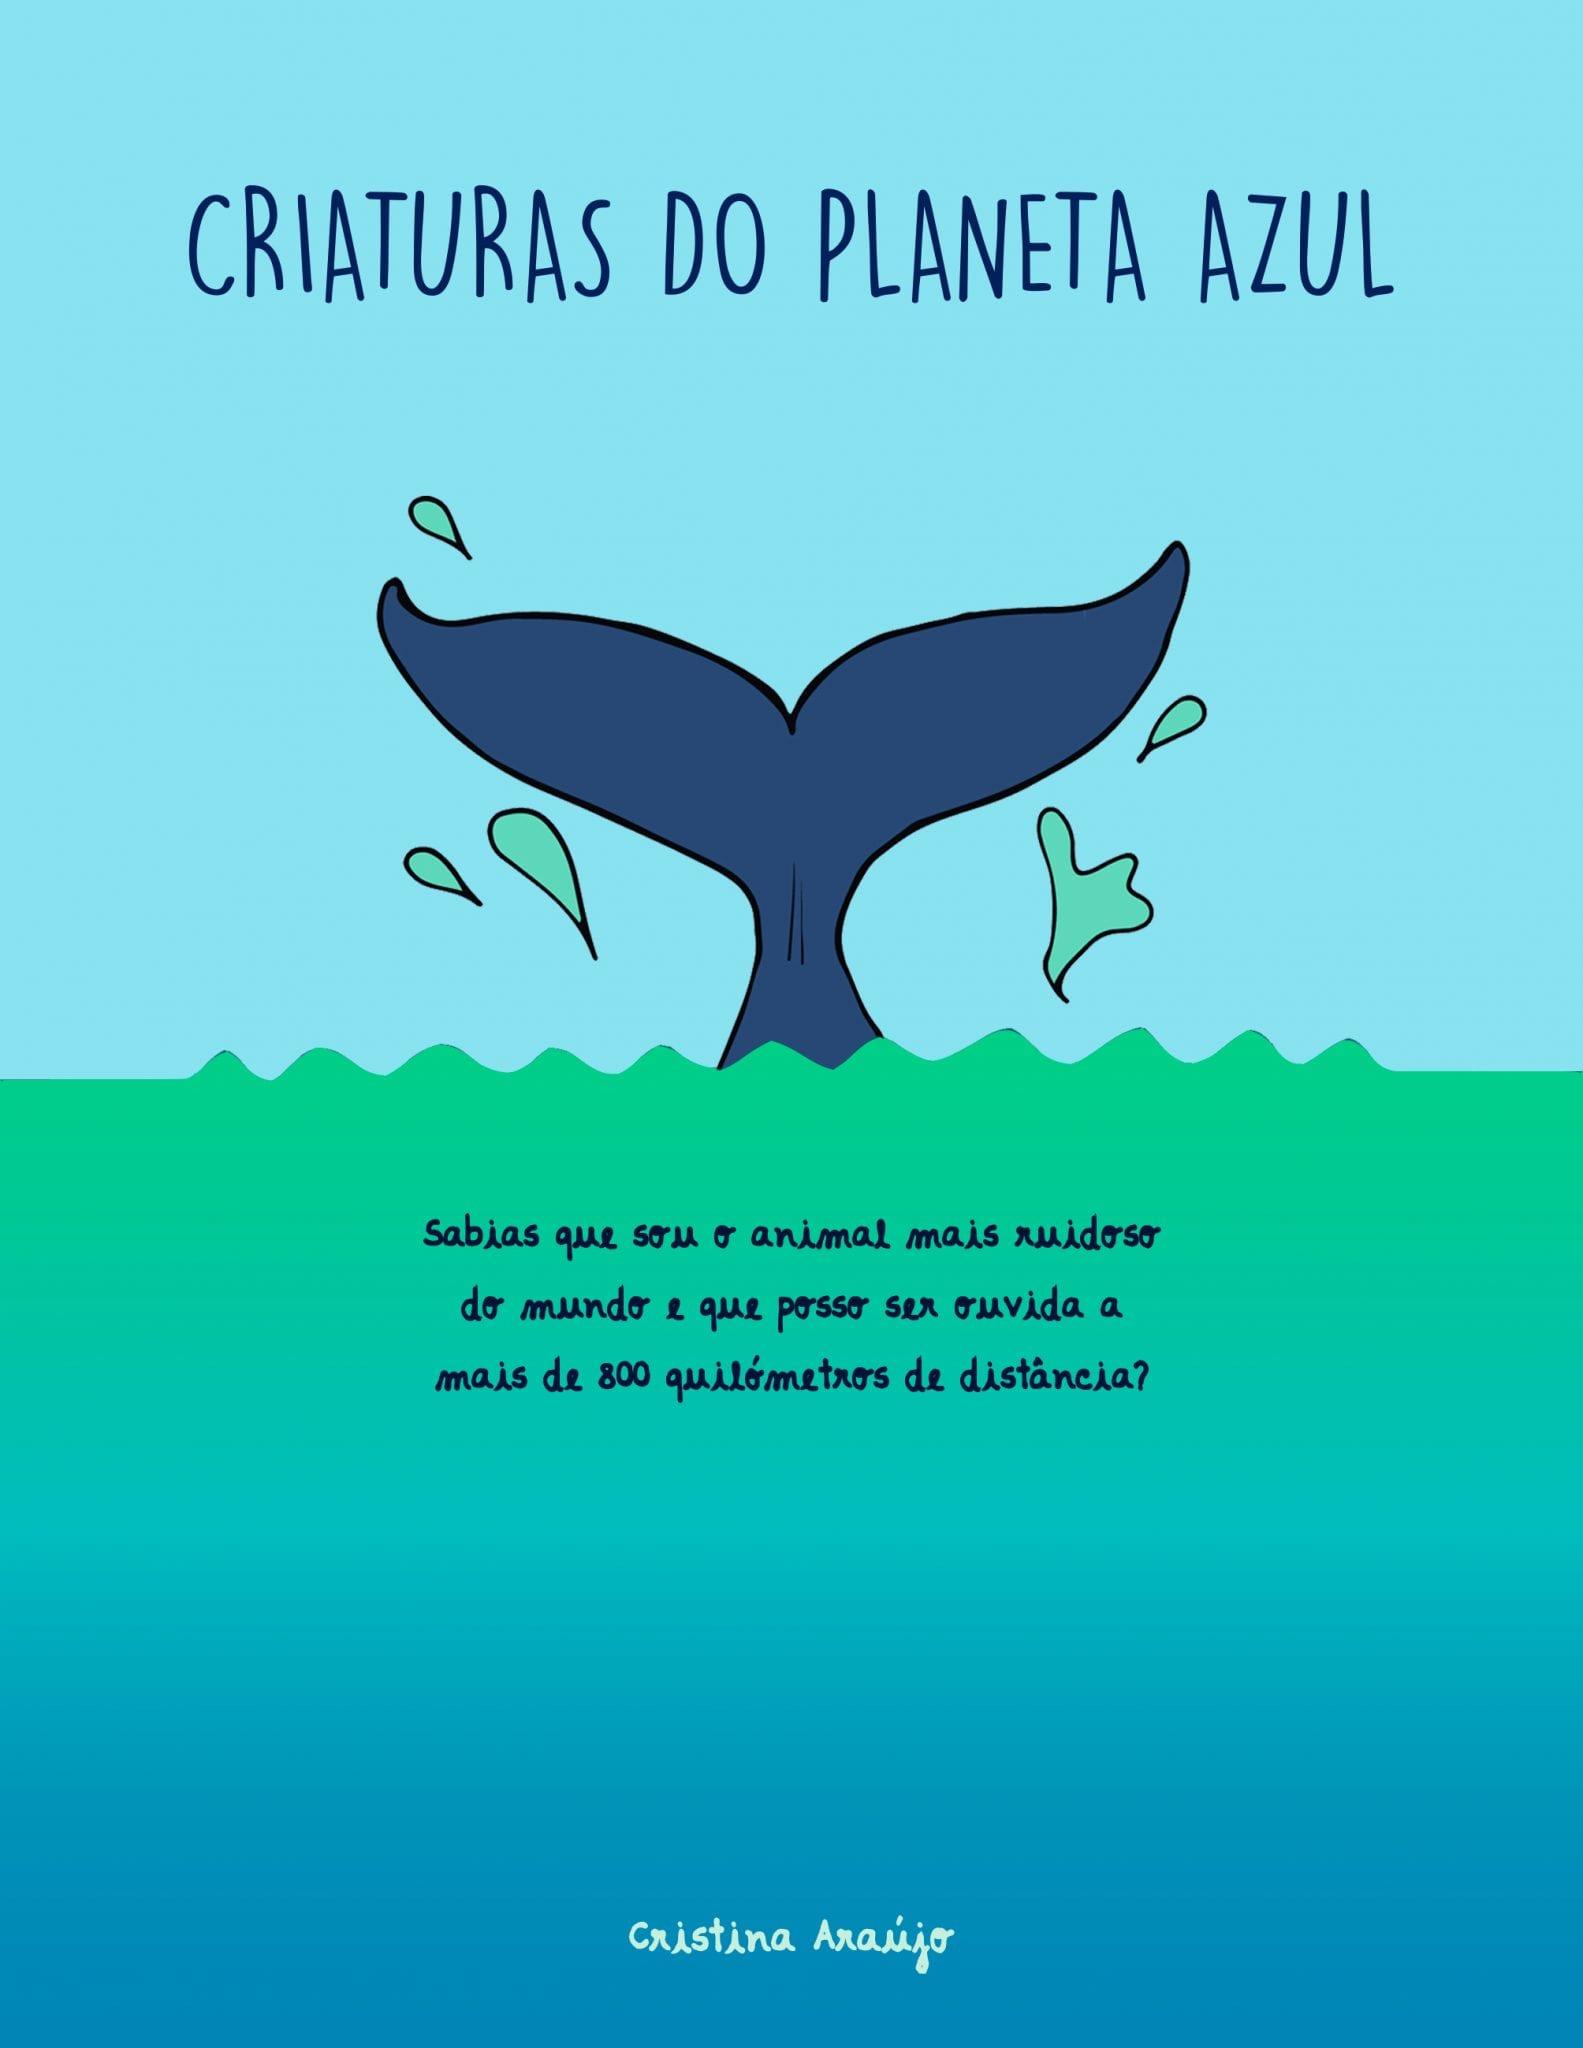 Capa_Criaturas do Planeta Azul_Cristina Araújo